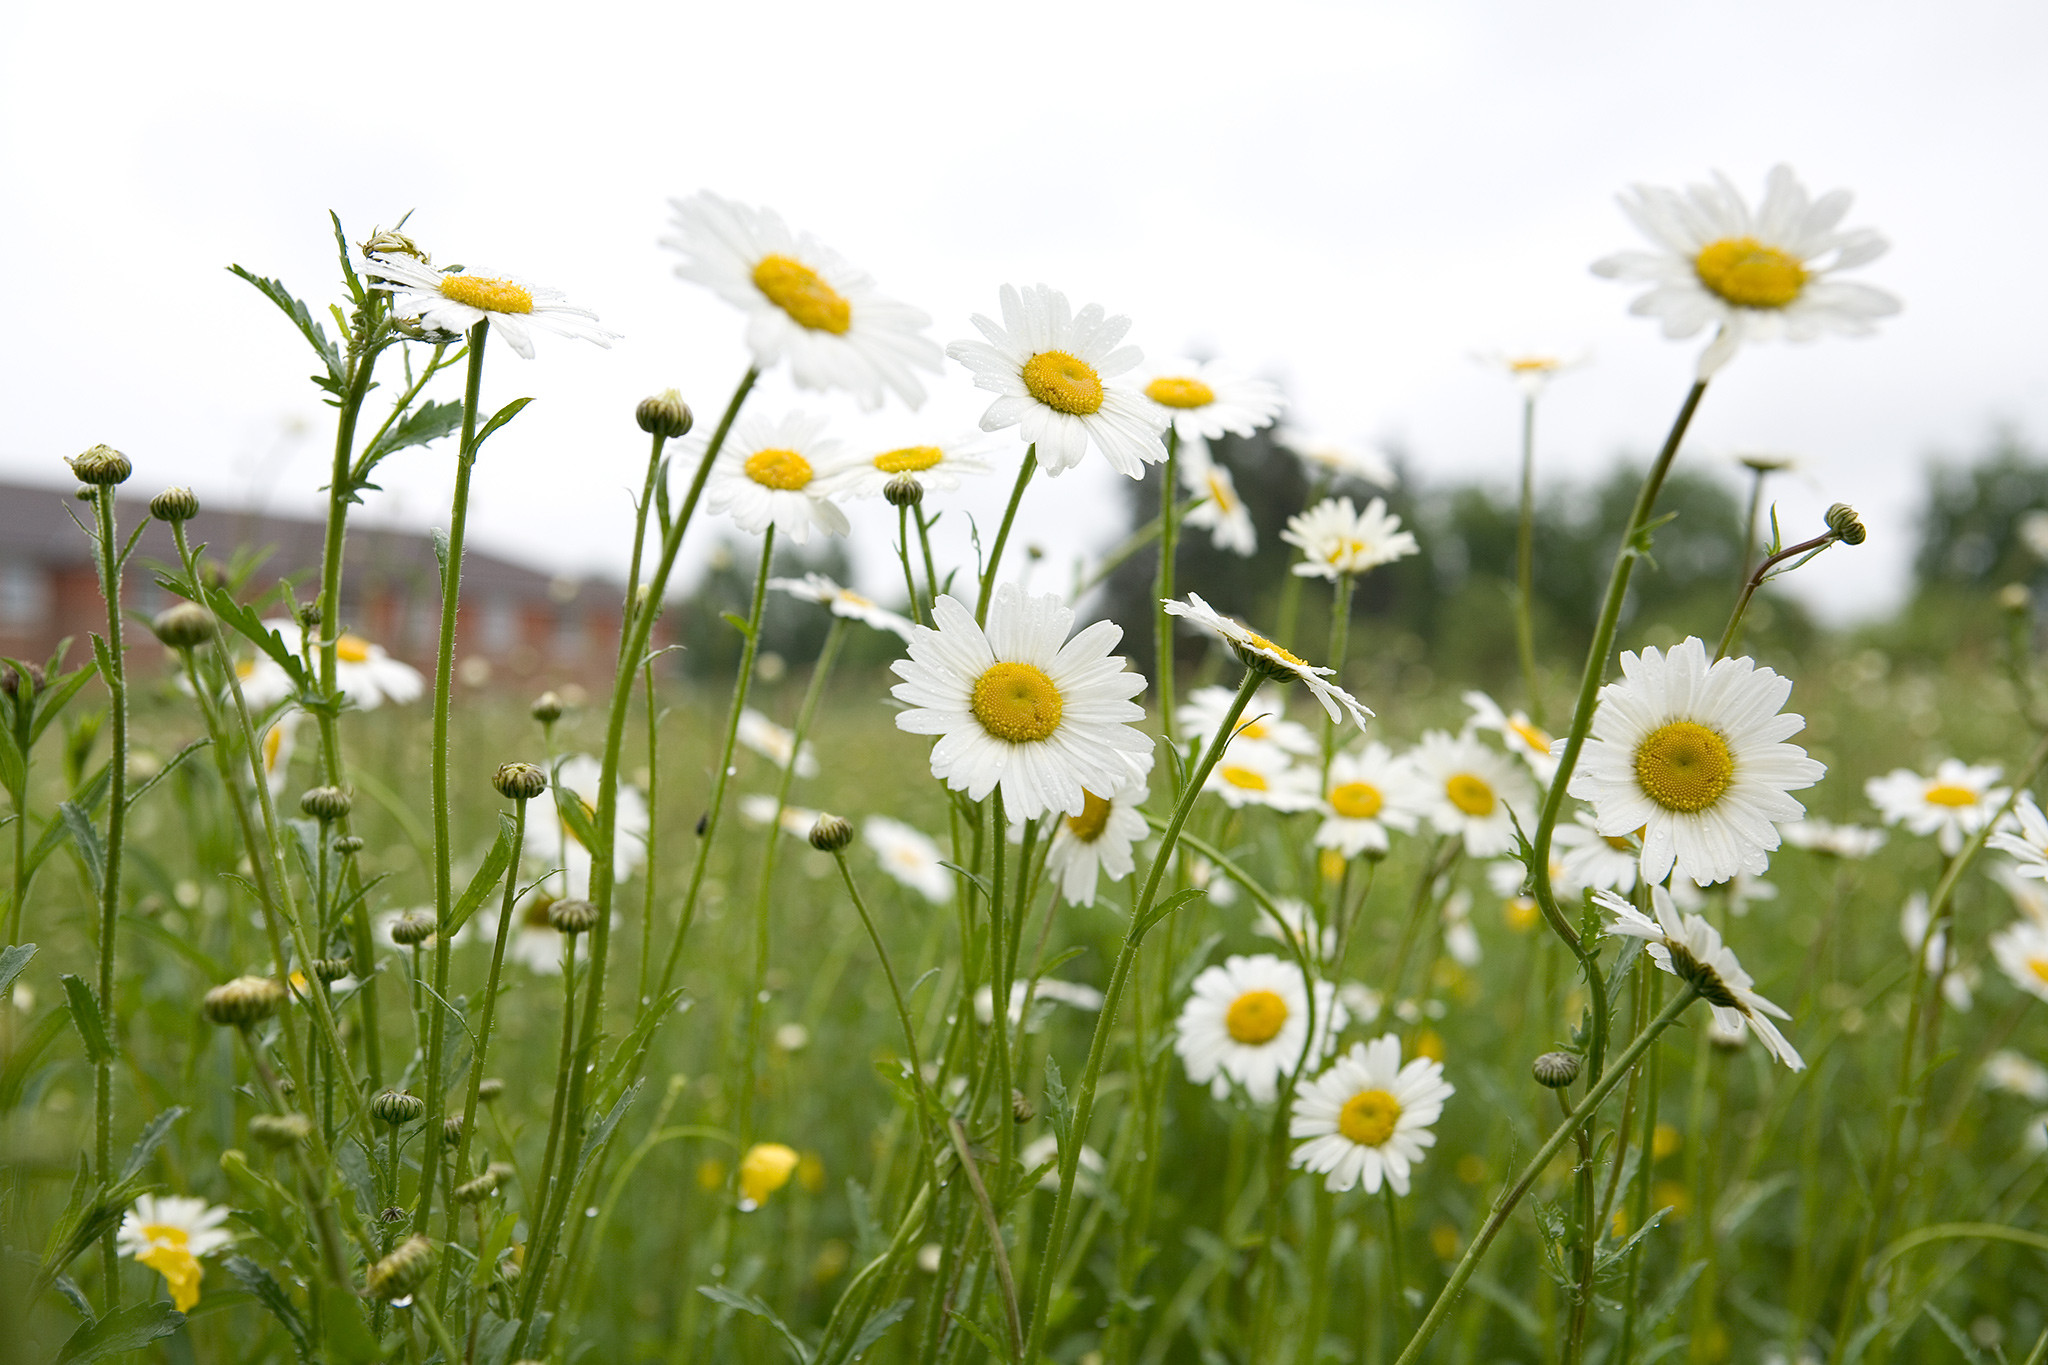 Ox-eye daisy. Leucanthemum vulgare.